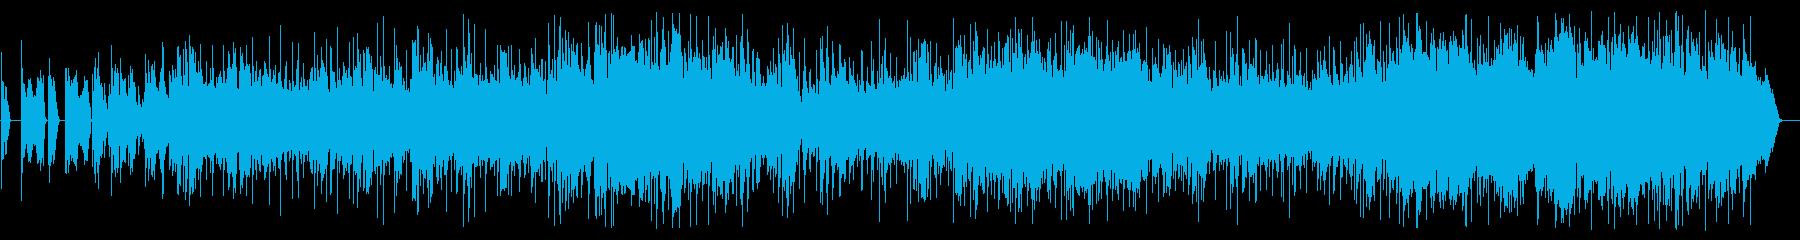 SAXエレピが切なく響くスローグルーブの再生済みの波形